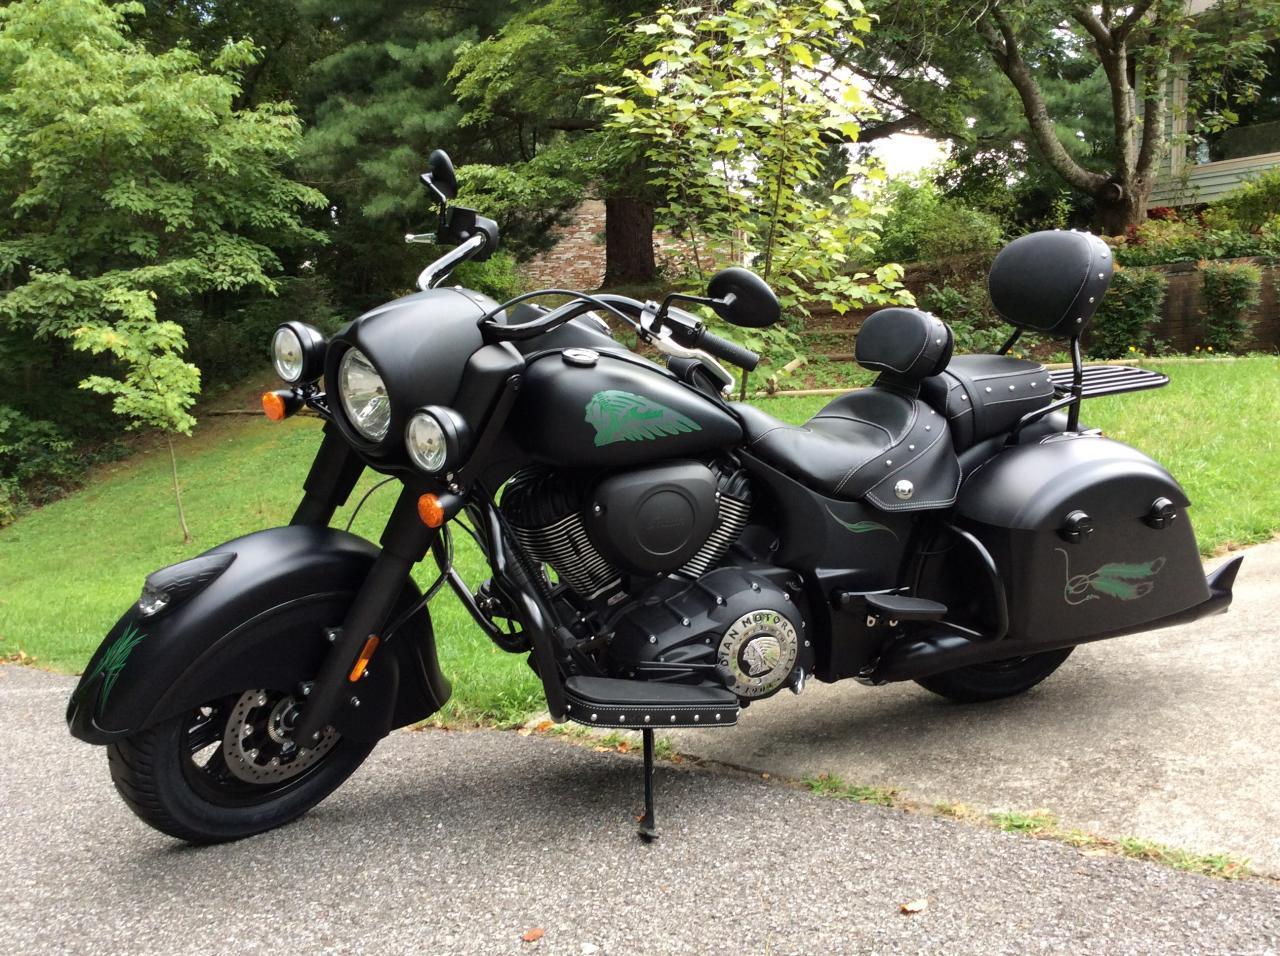 chief motorcycle forum indian motorcycles dark horse bagger. Black Bedroom Furniture Sets. Home Design Ideas